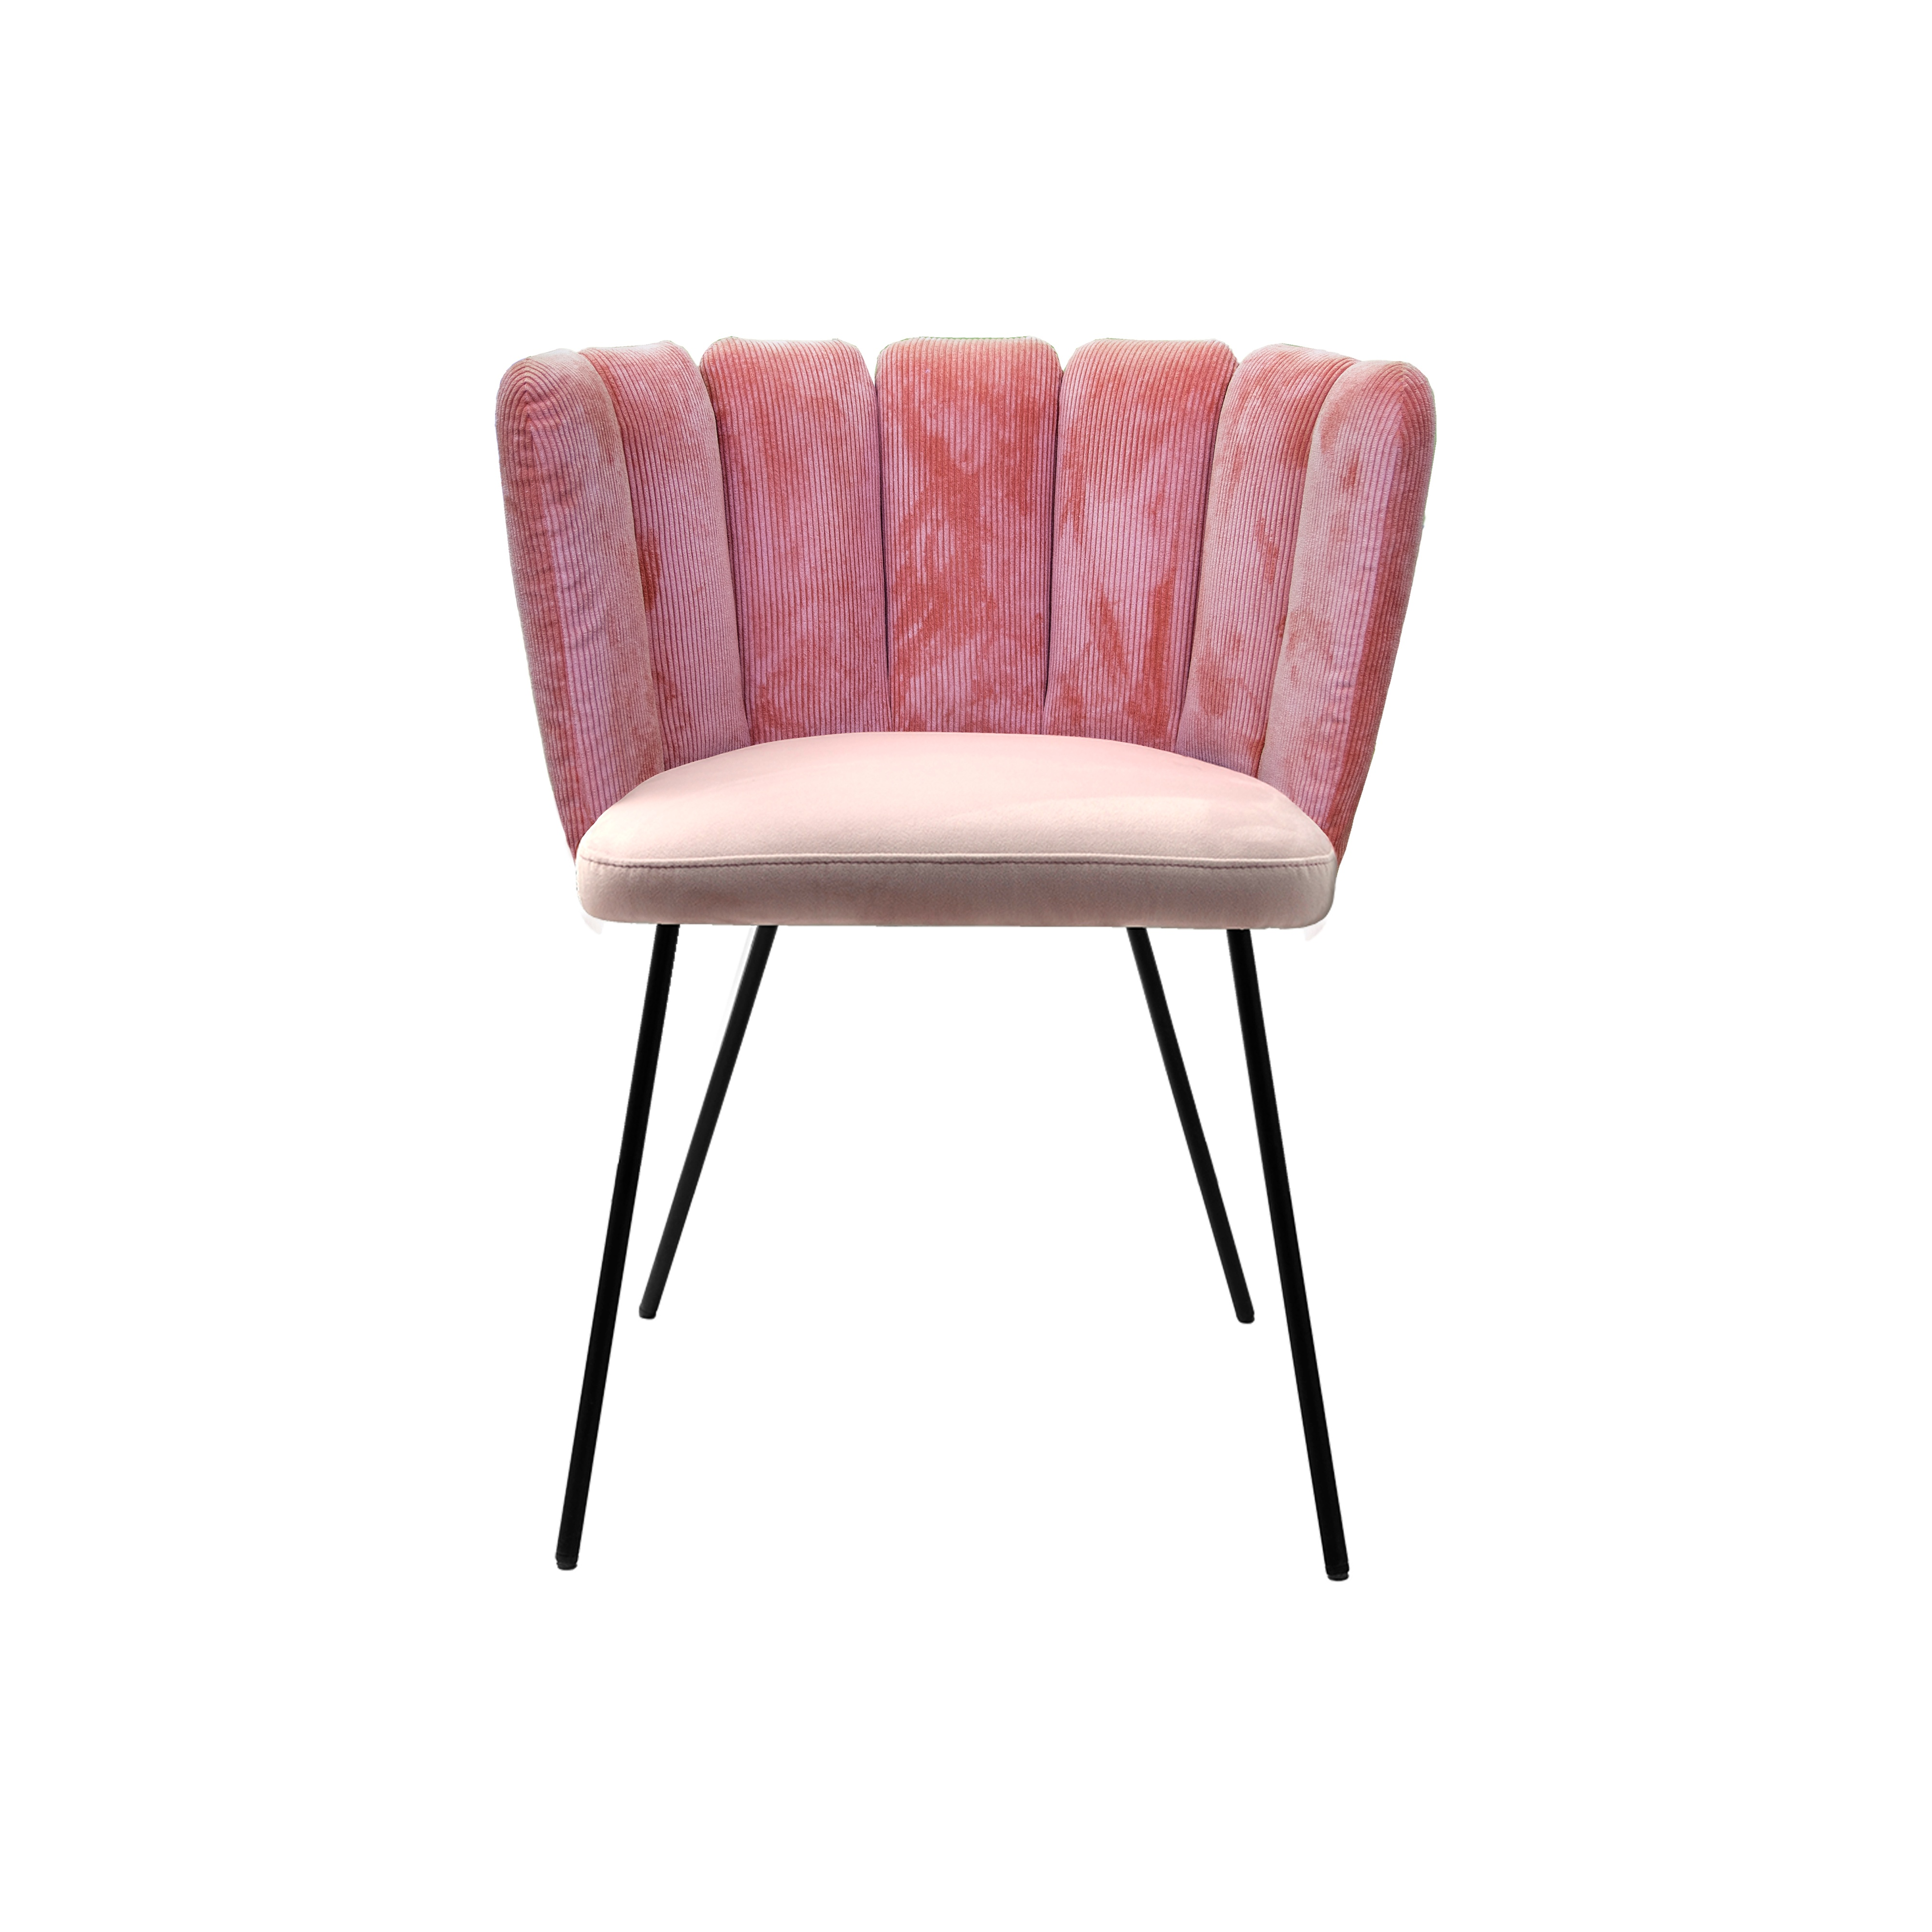 Gaia chair in pink velvet